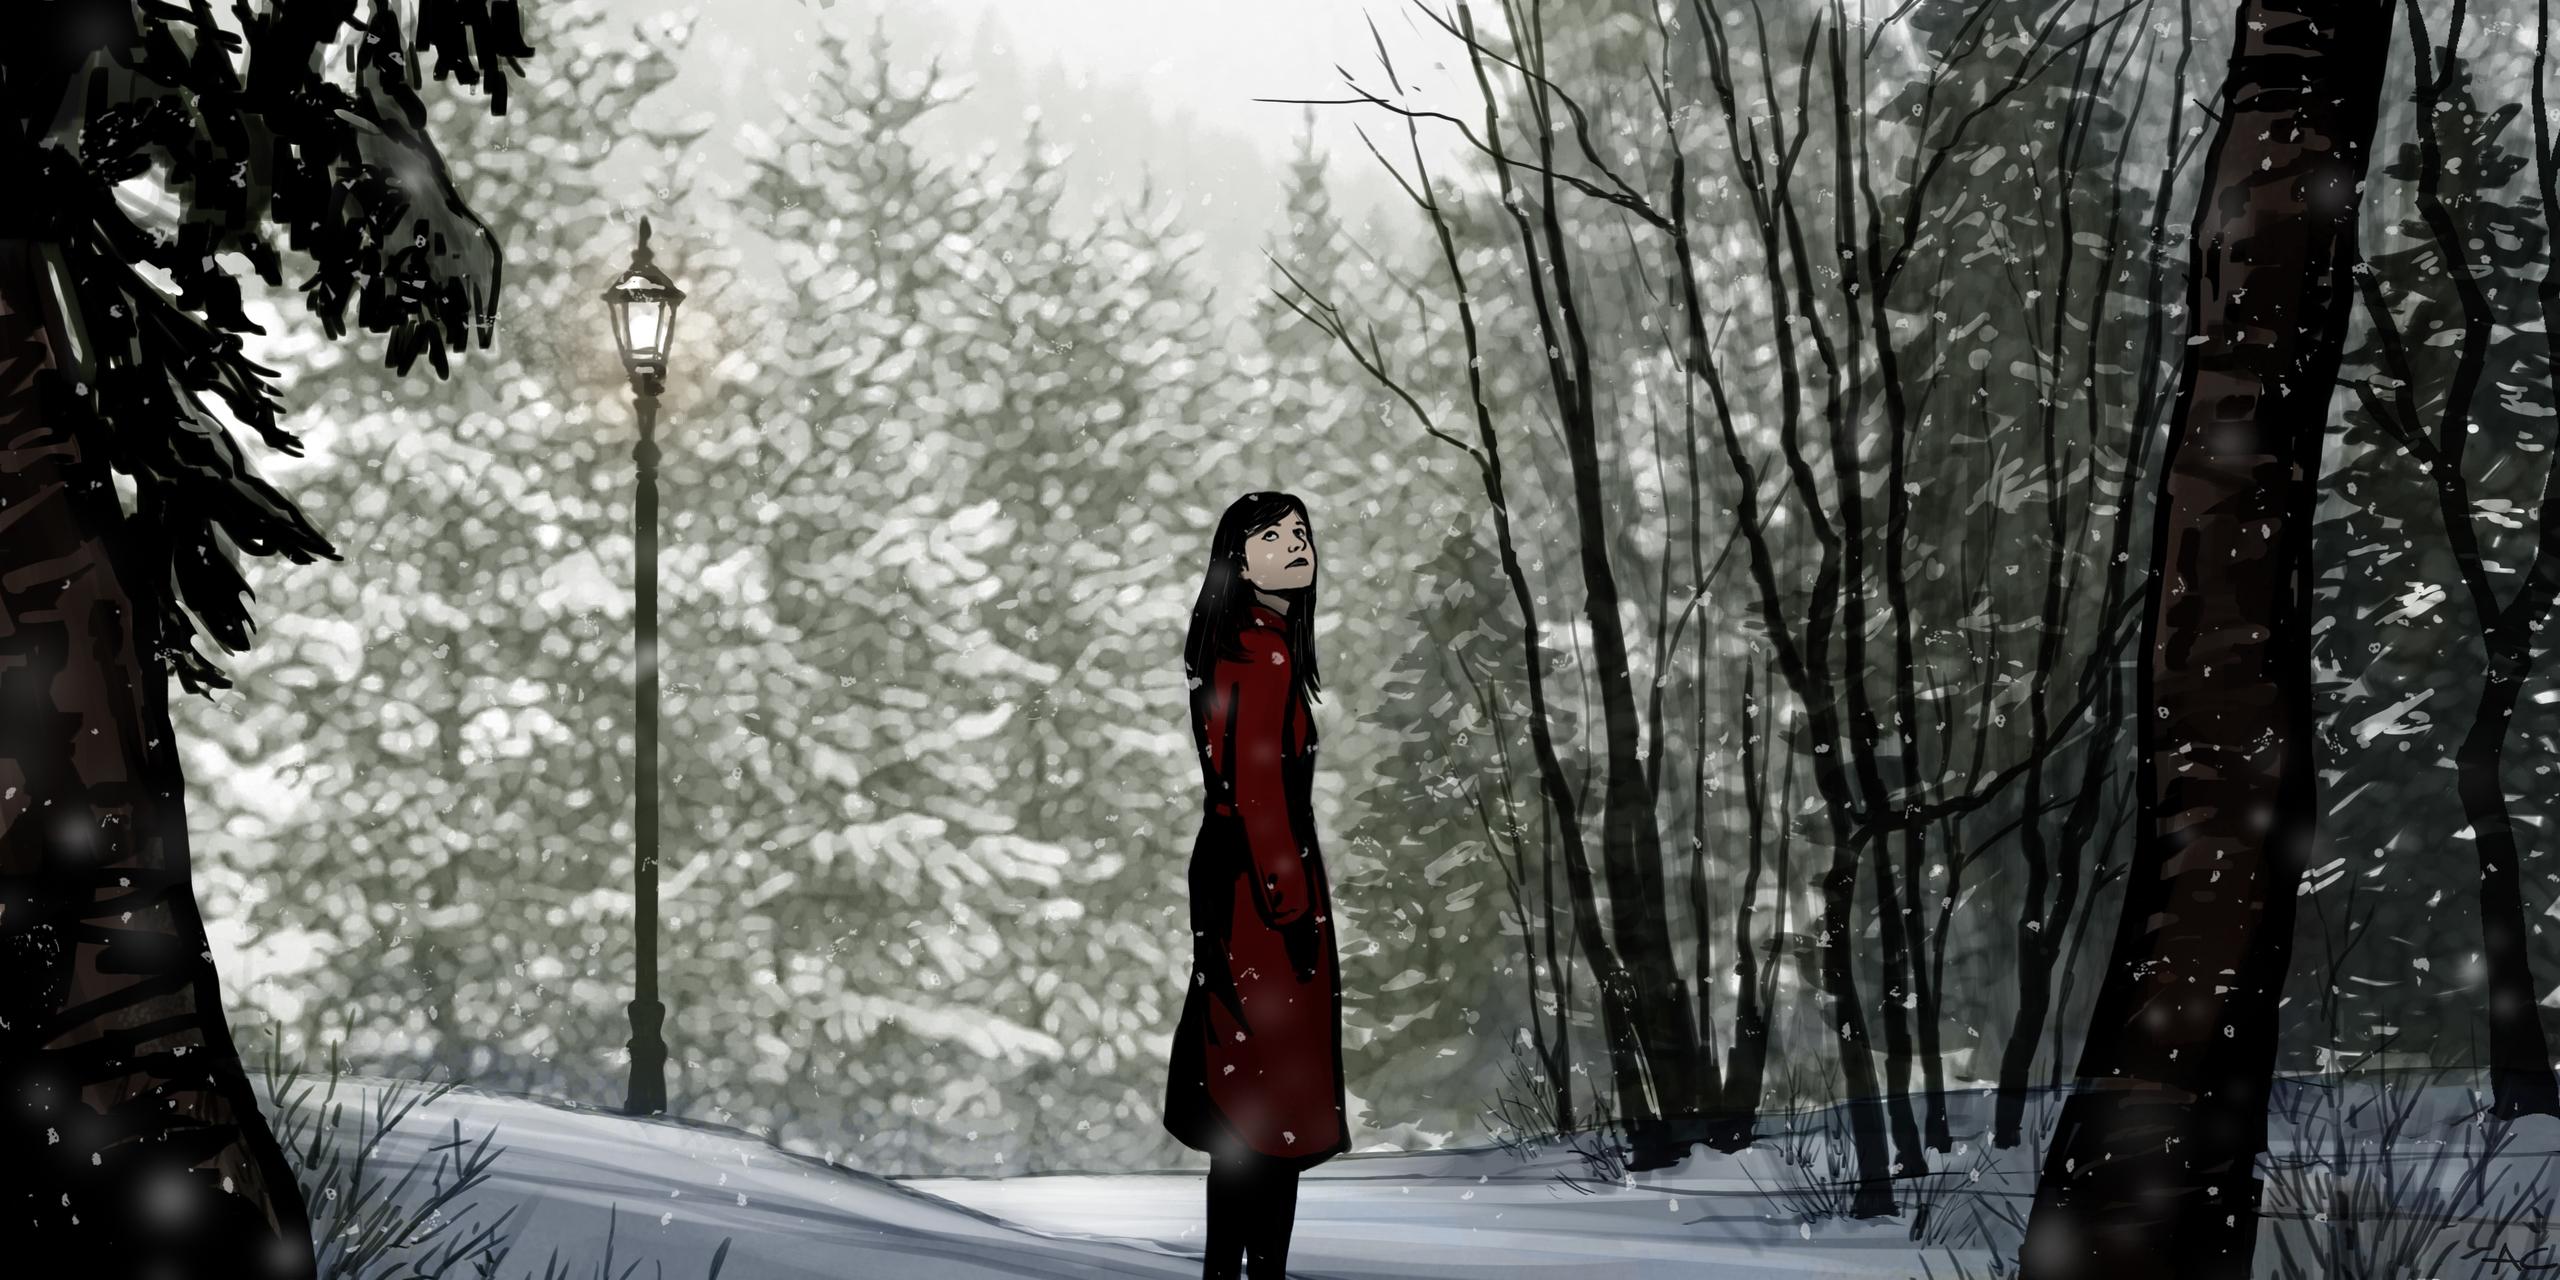 Narnia - cslewis, narnia - andrewcherry   ello